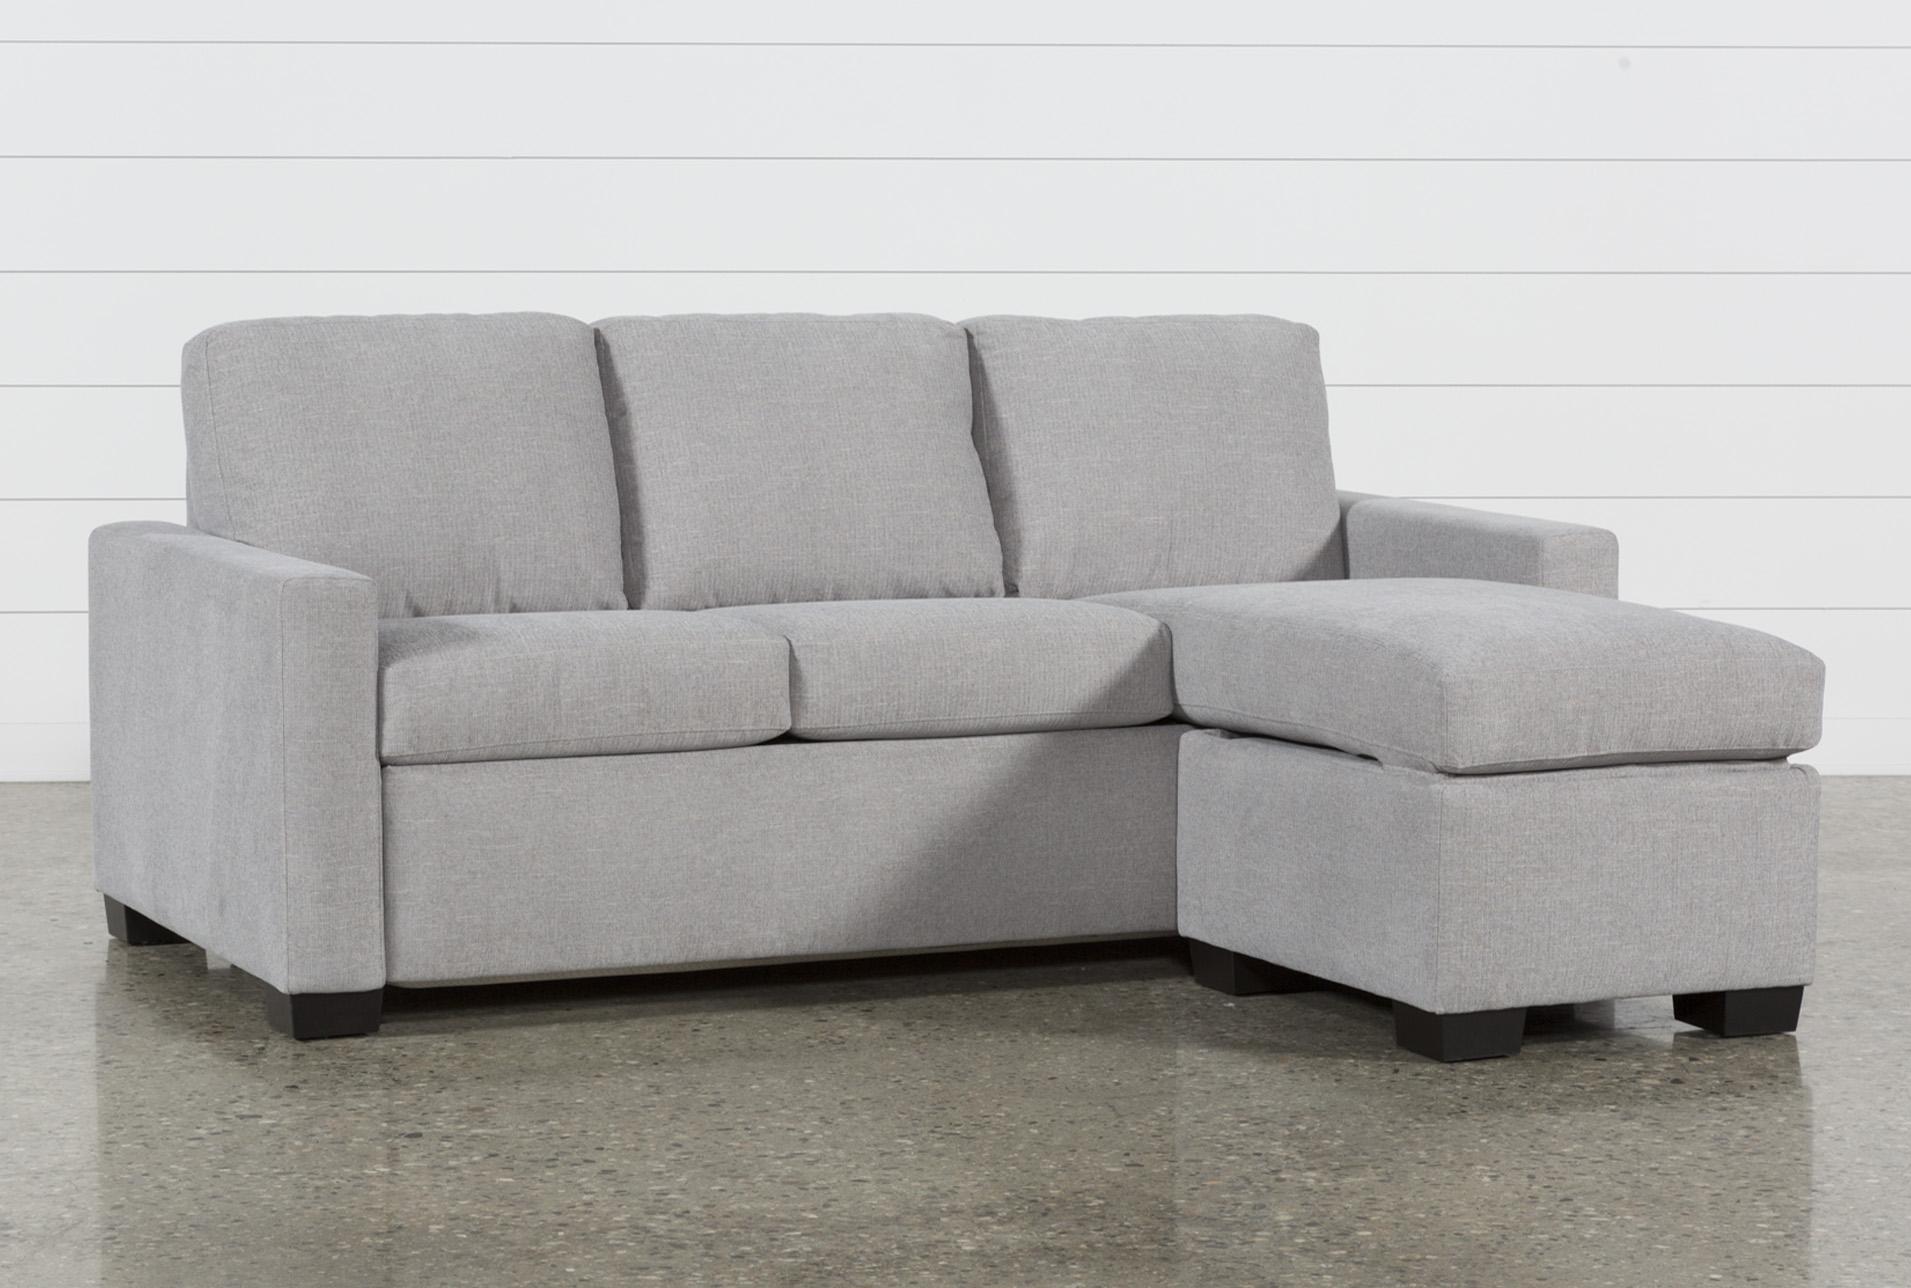 Queen sleeper sofa Mackenzie Silverpine Queen plus sleeper sofa with storage bed POMLJPV